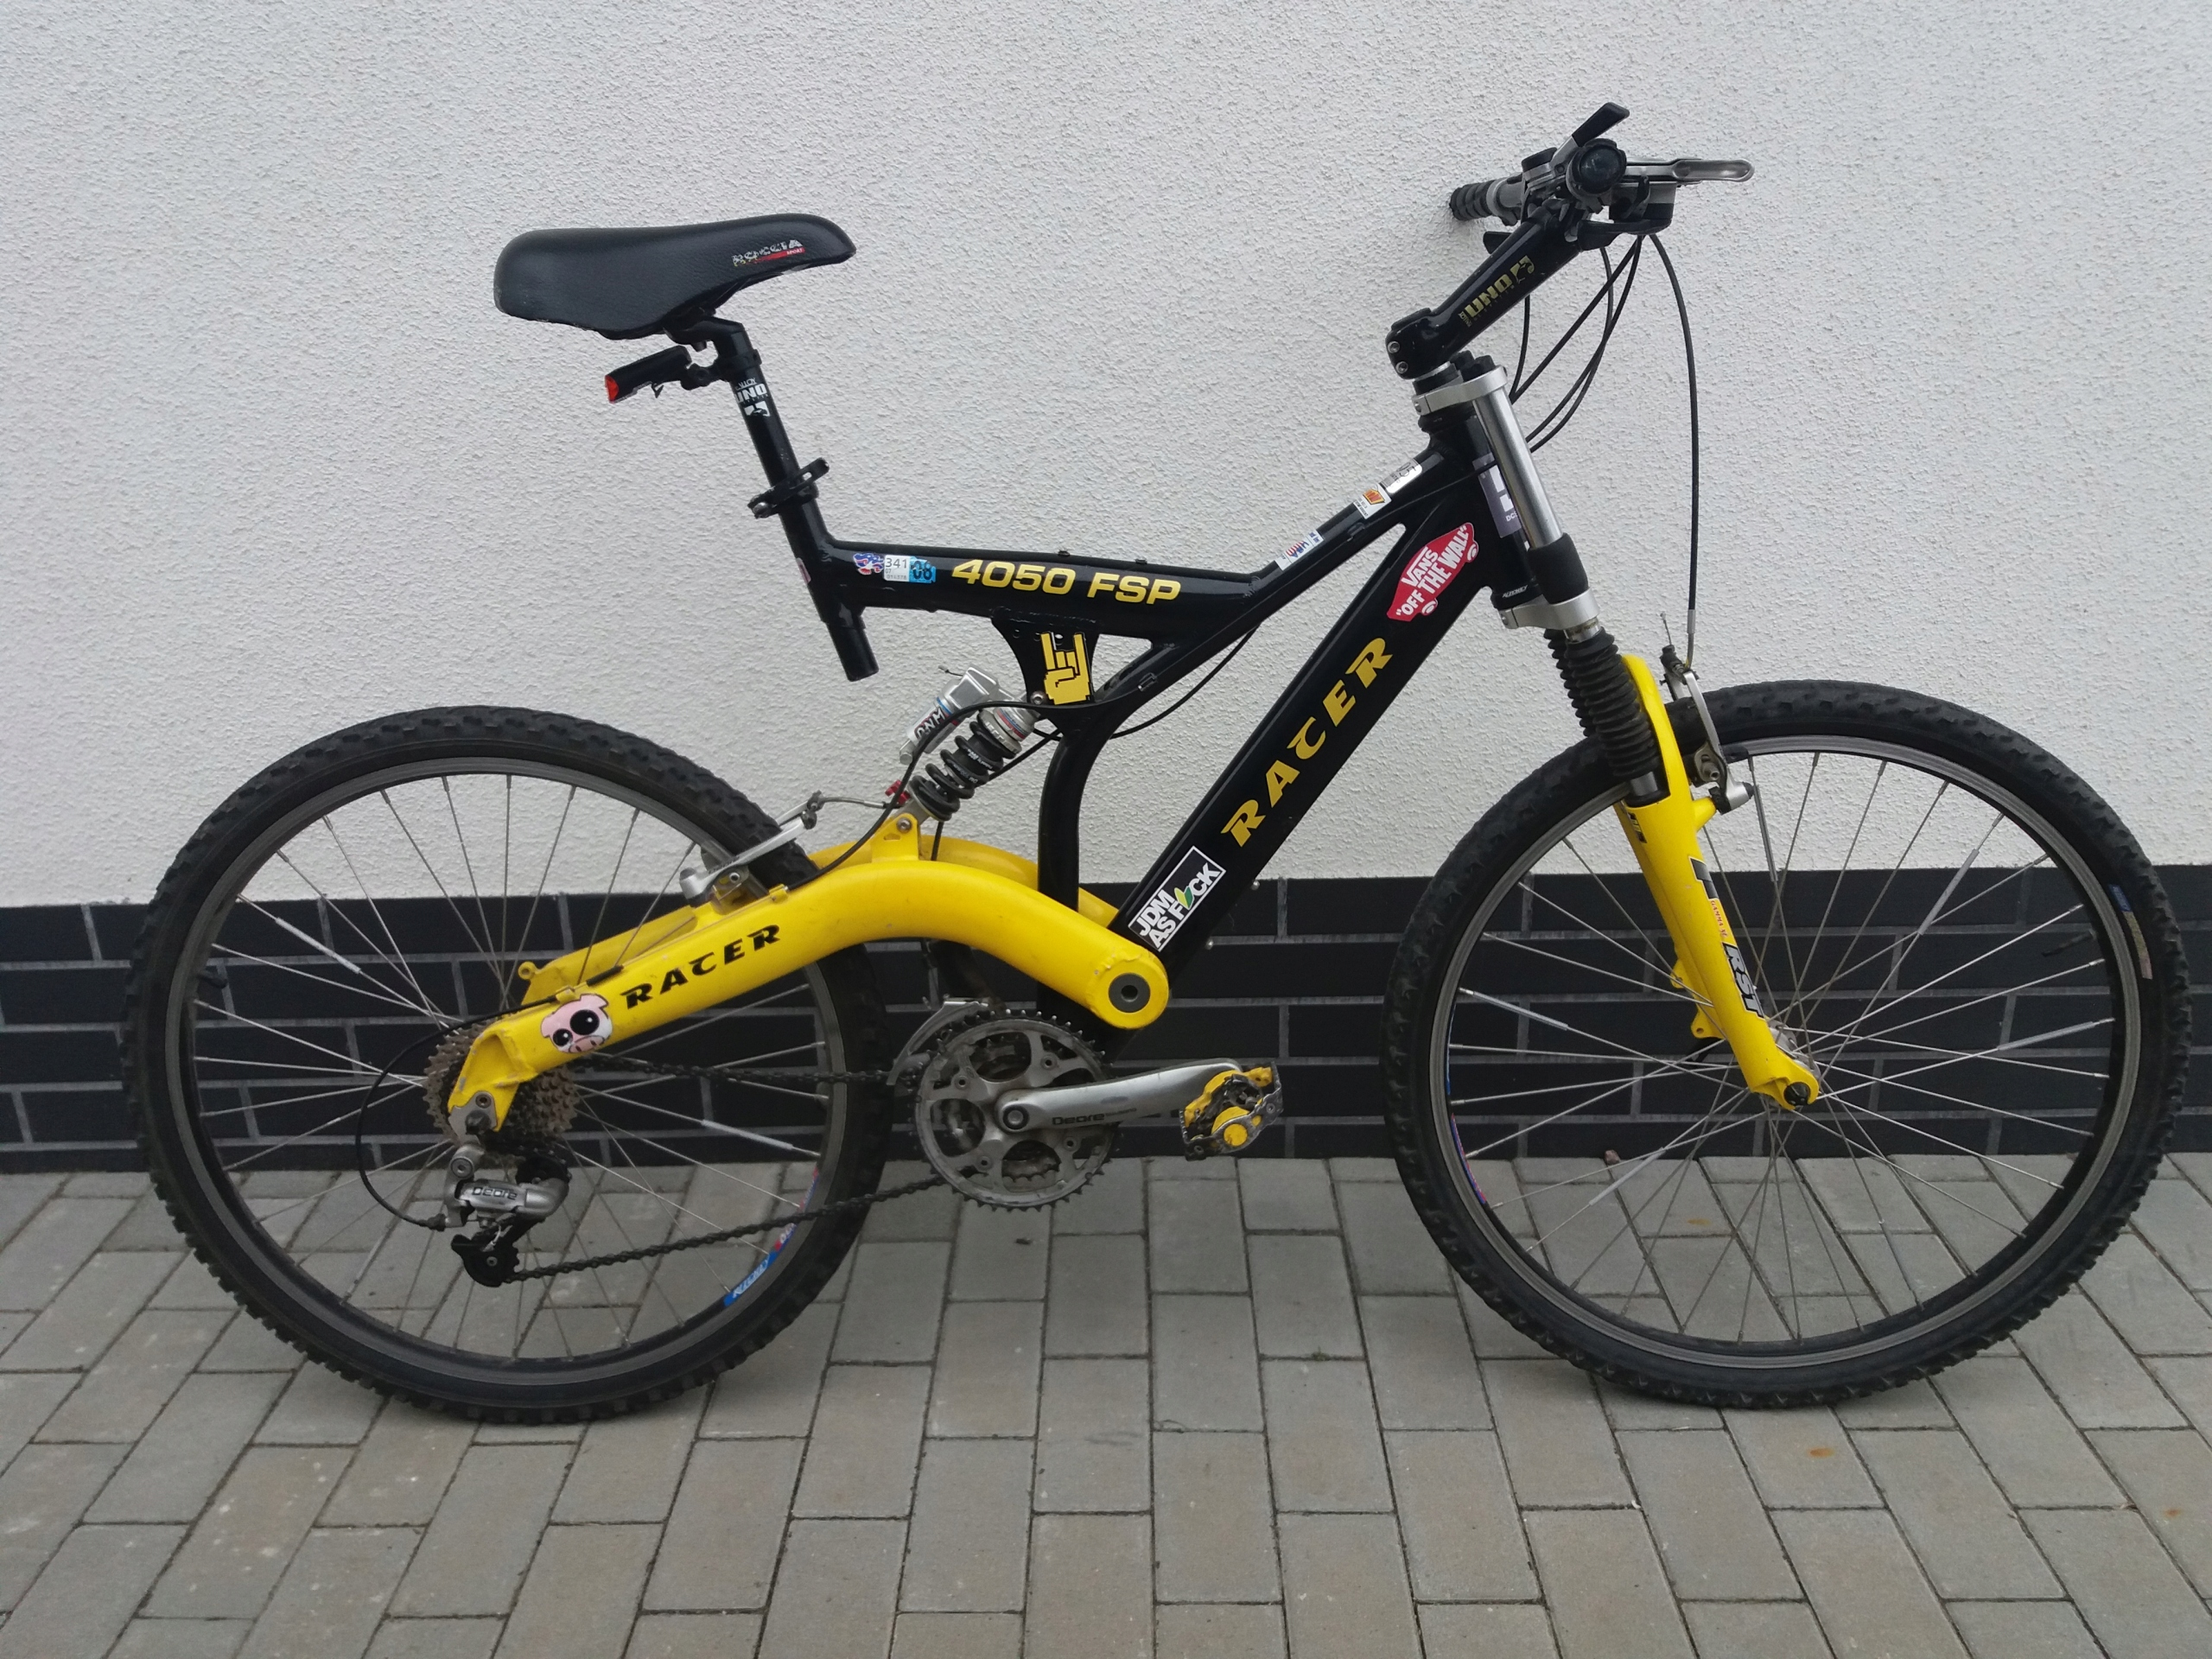 "Alu Rower Zjazdowy Racer 4050 FSP Deore 21"""